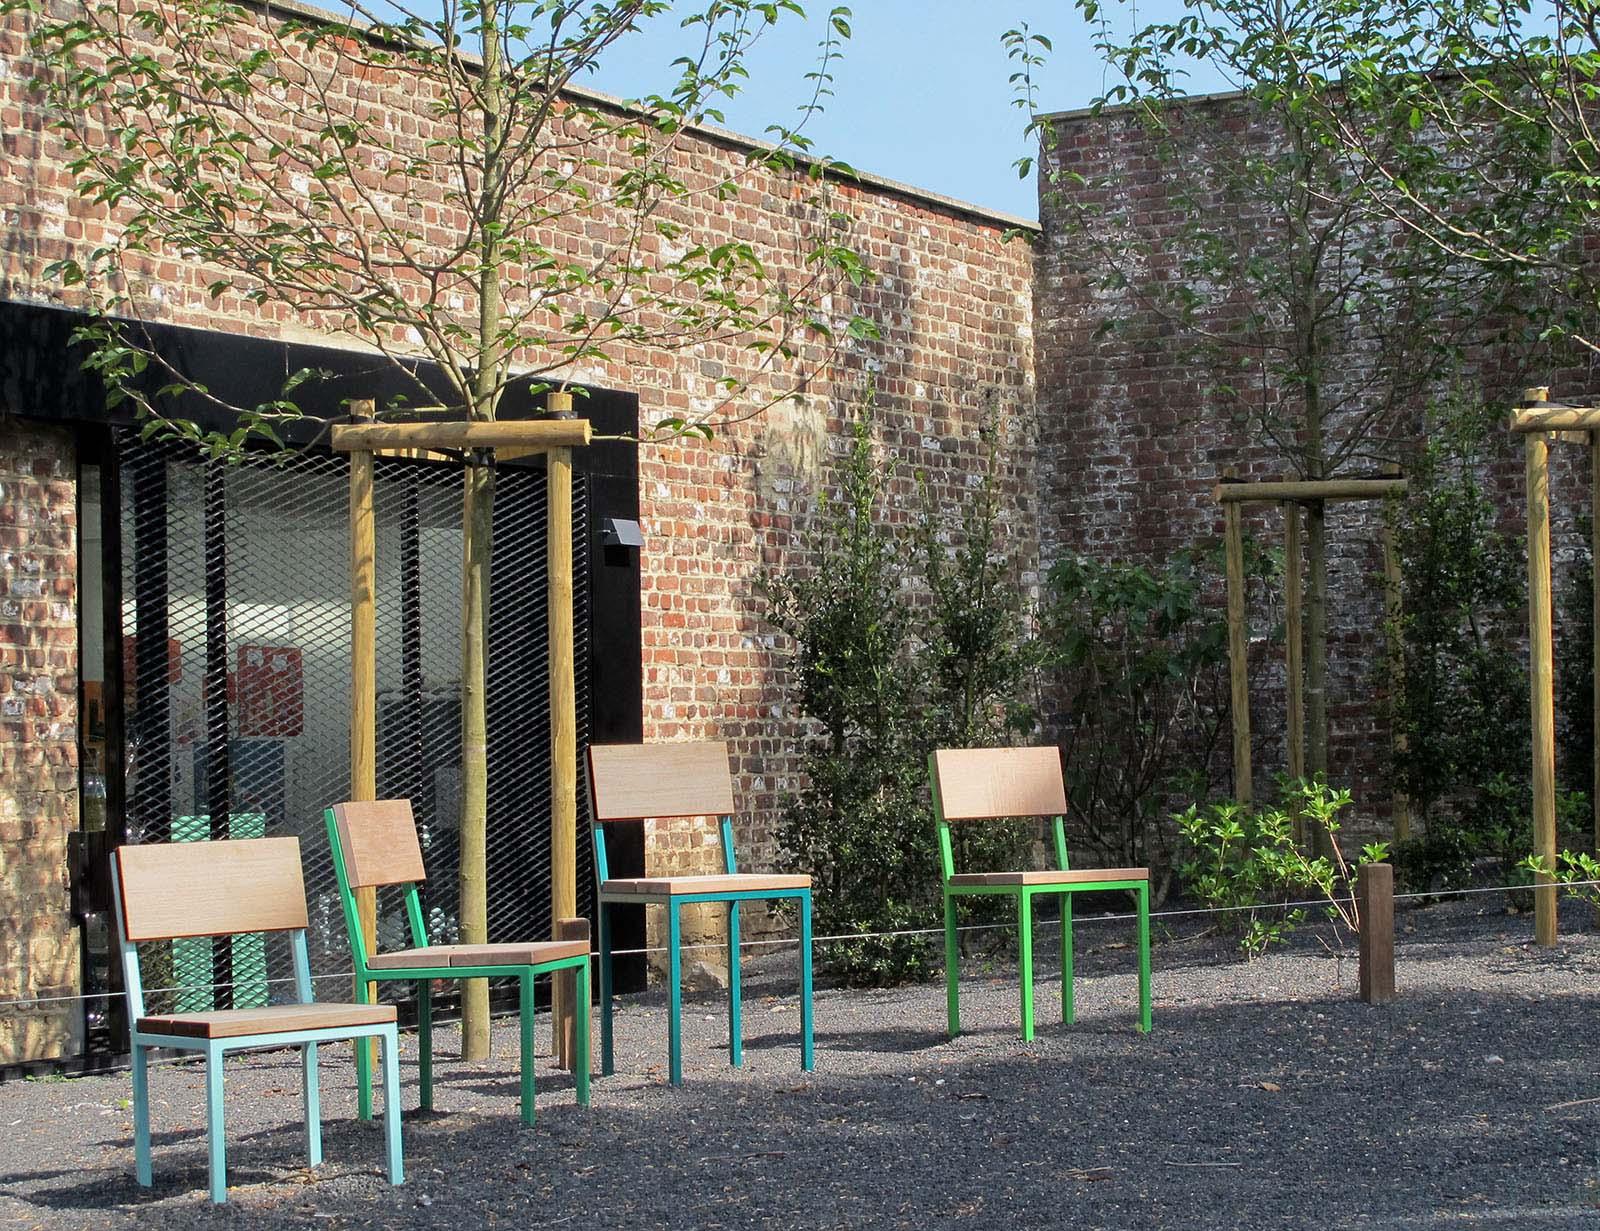 mobilier urbain_myplace_Molenbeek- Lucile Soufflet_3